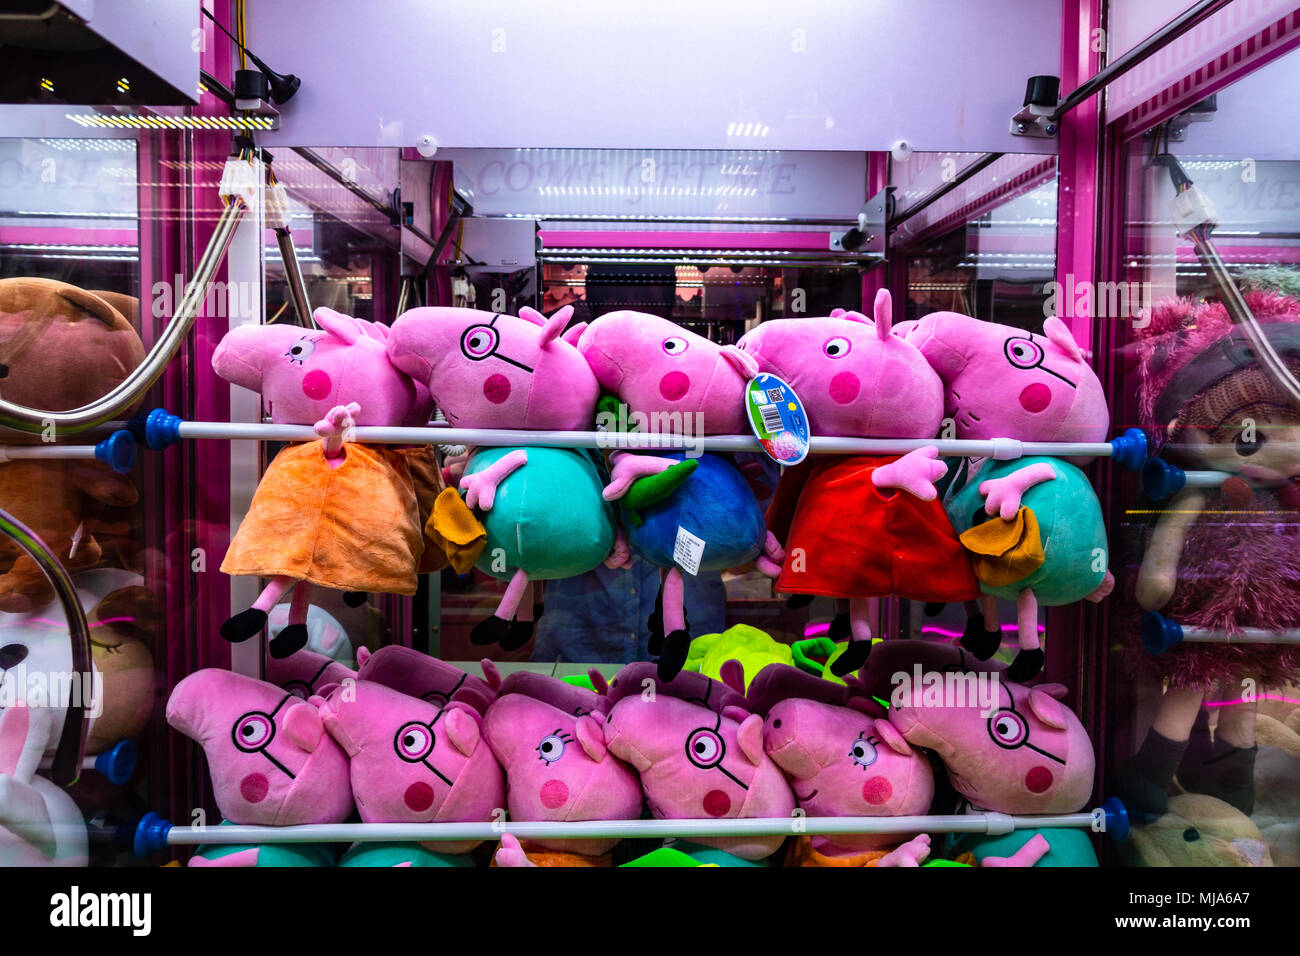 Peppa Pig plush dolls toys inside a claw machine - Stock Image